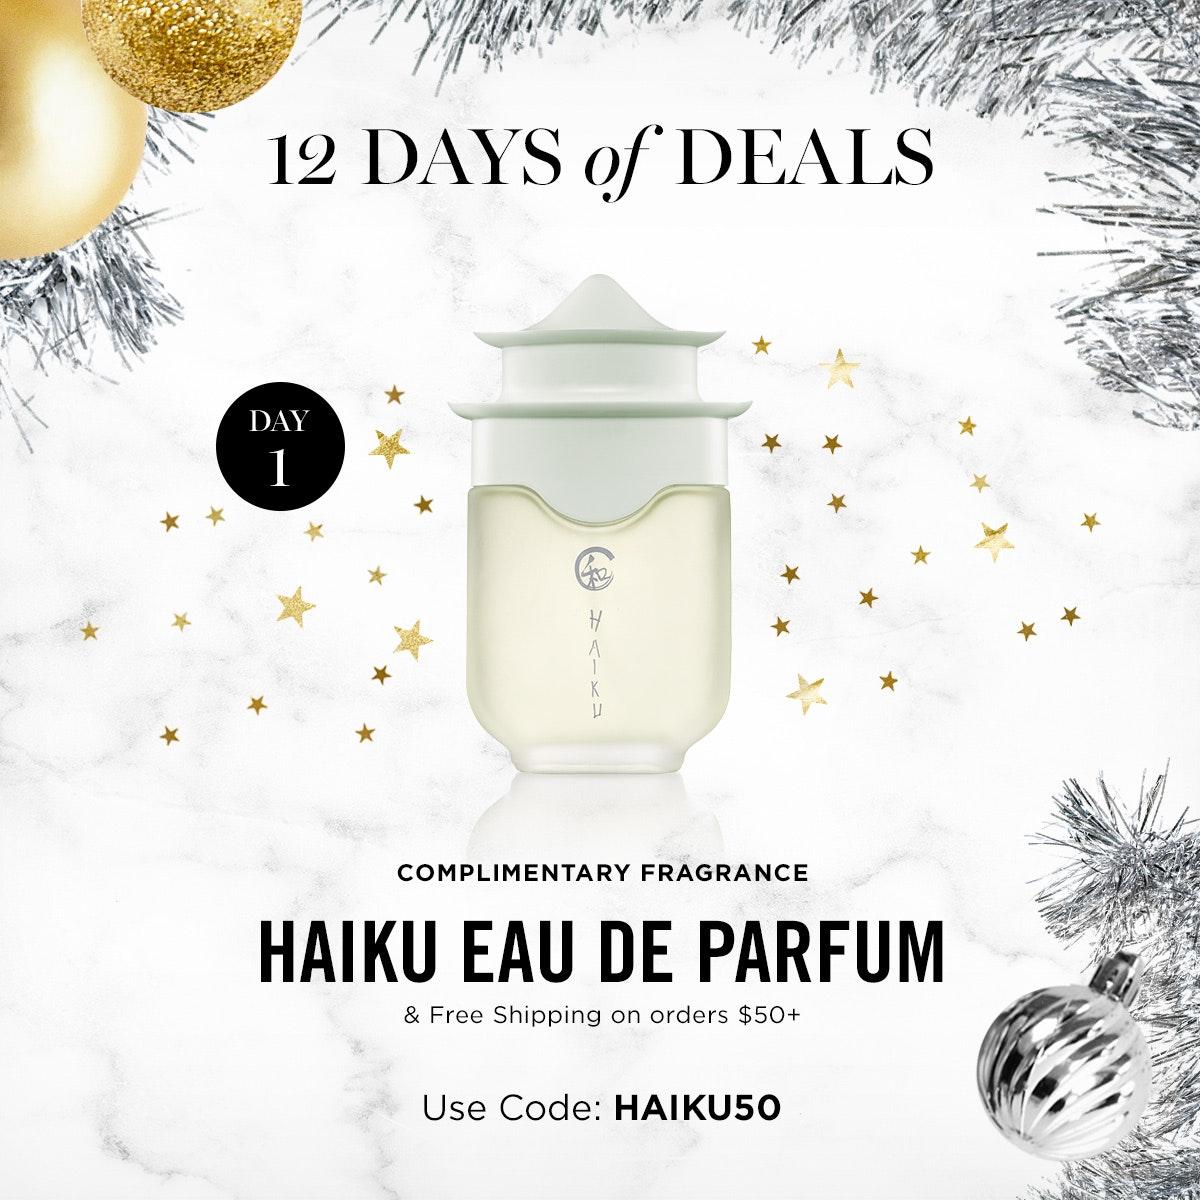 Avon 12 Days Of Deals – FREE Complimentary Fragrance Haiku Eau De Parfum